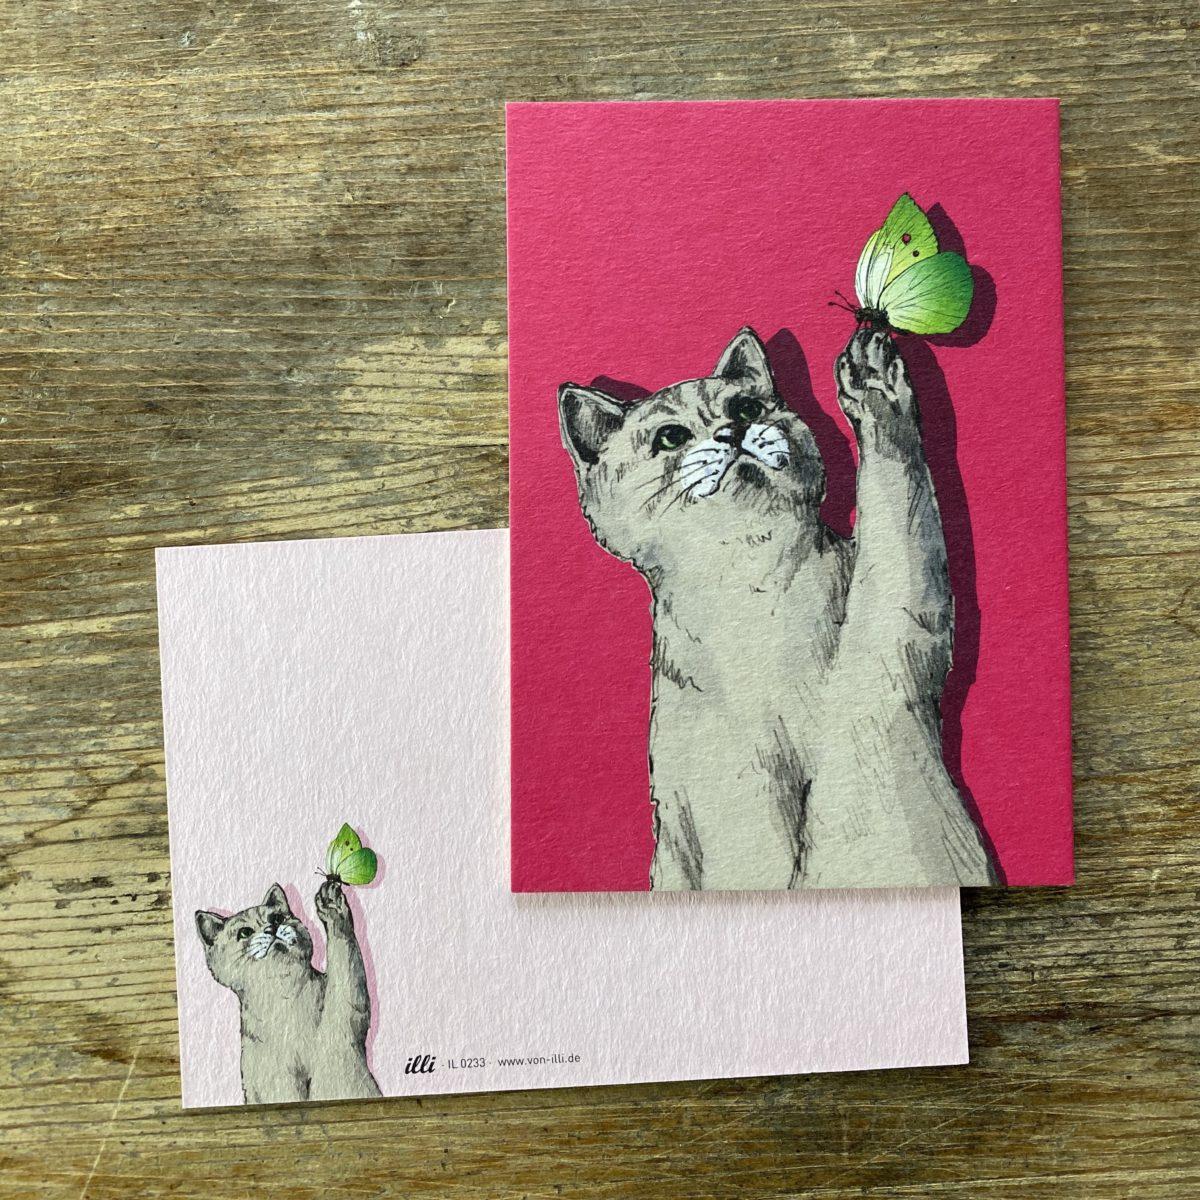 KYUTE Postkarte von illi MYLO